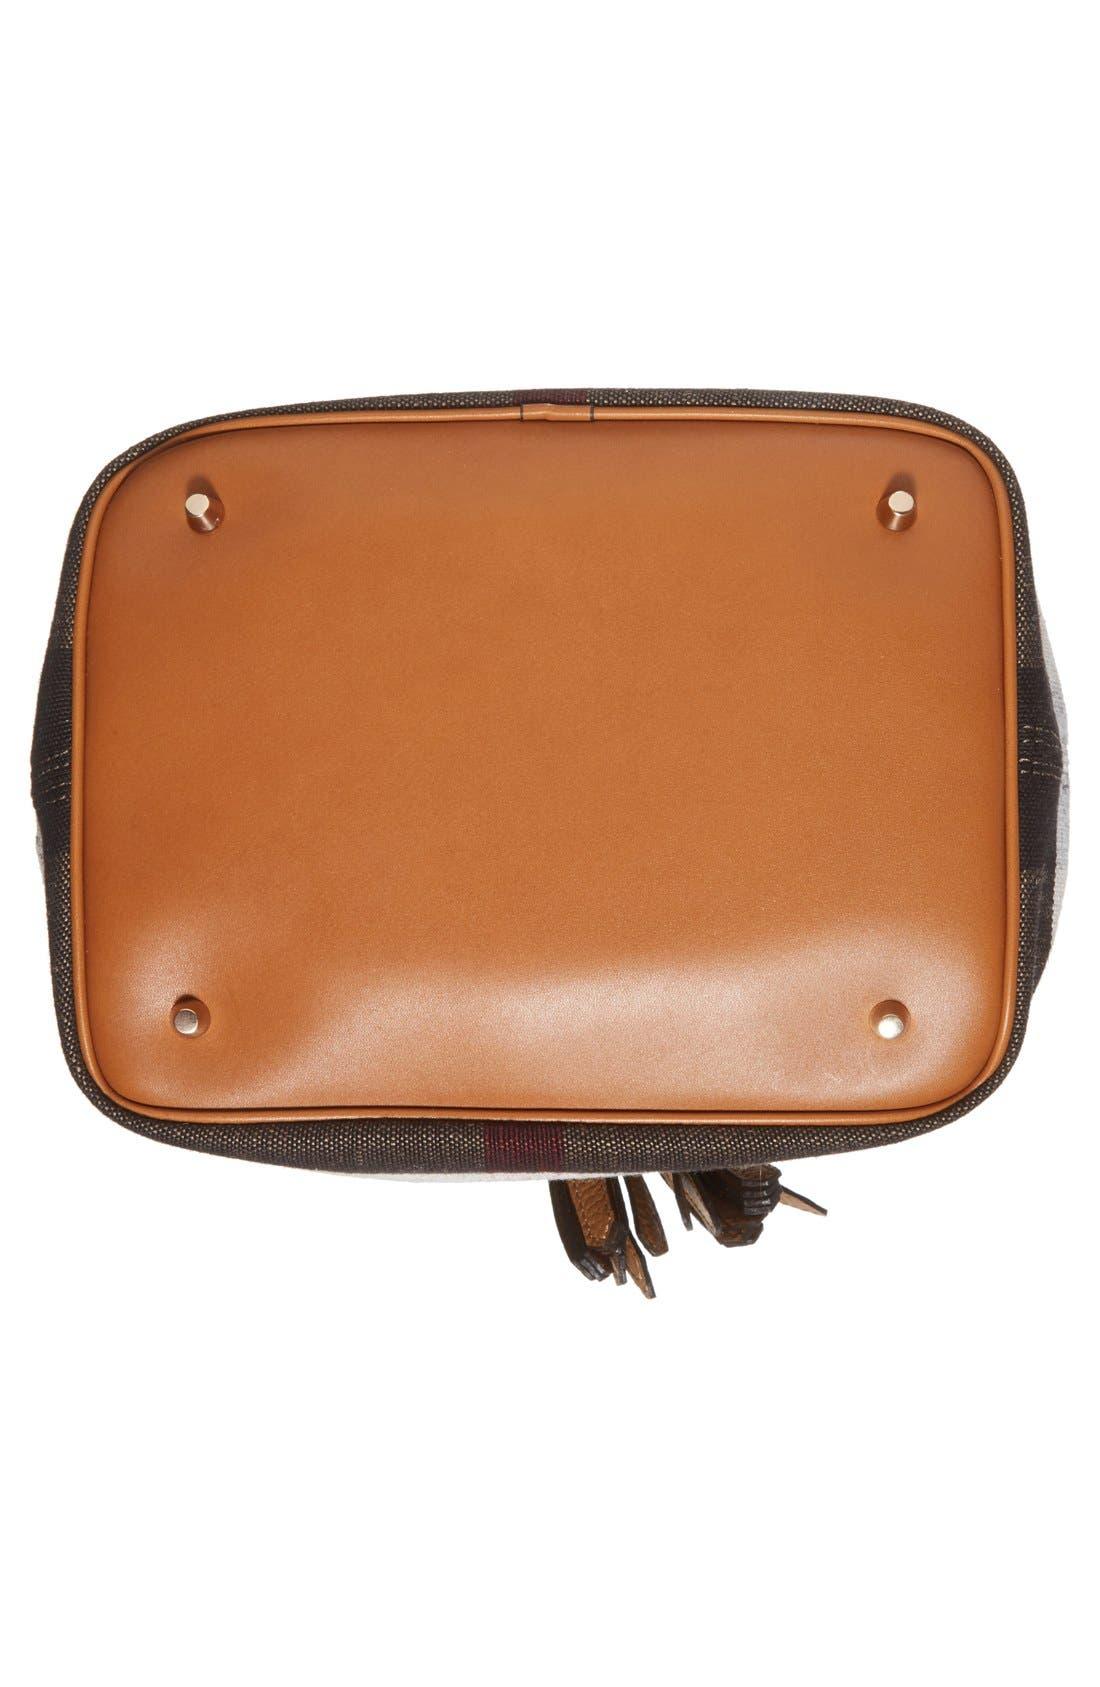 BURBERRY,                             Medium Ashby Bucket Bag,                             Alternate thumbnail 2, color,                             200